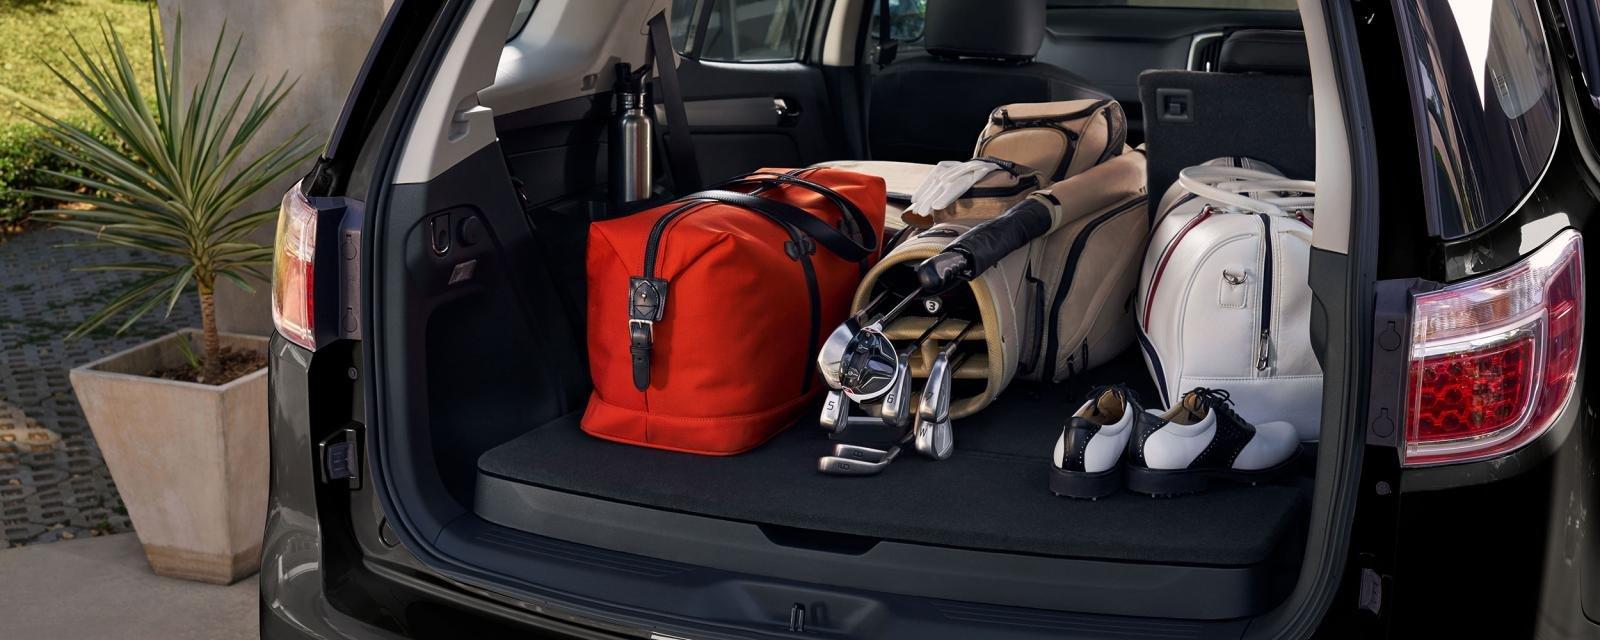 SUV 7 chỗ Chevrolet Trailblazer 2020 giảm tới 200 triệu đồng - Ảnh 1.